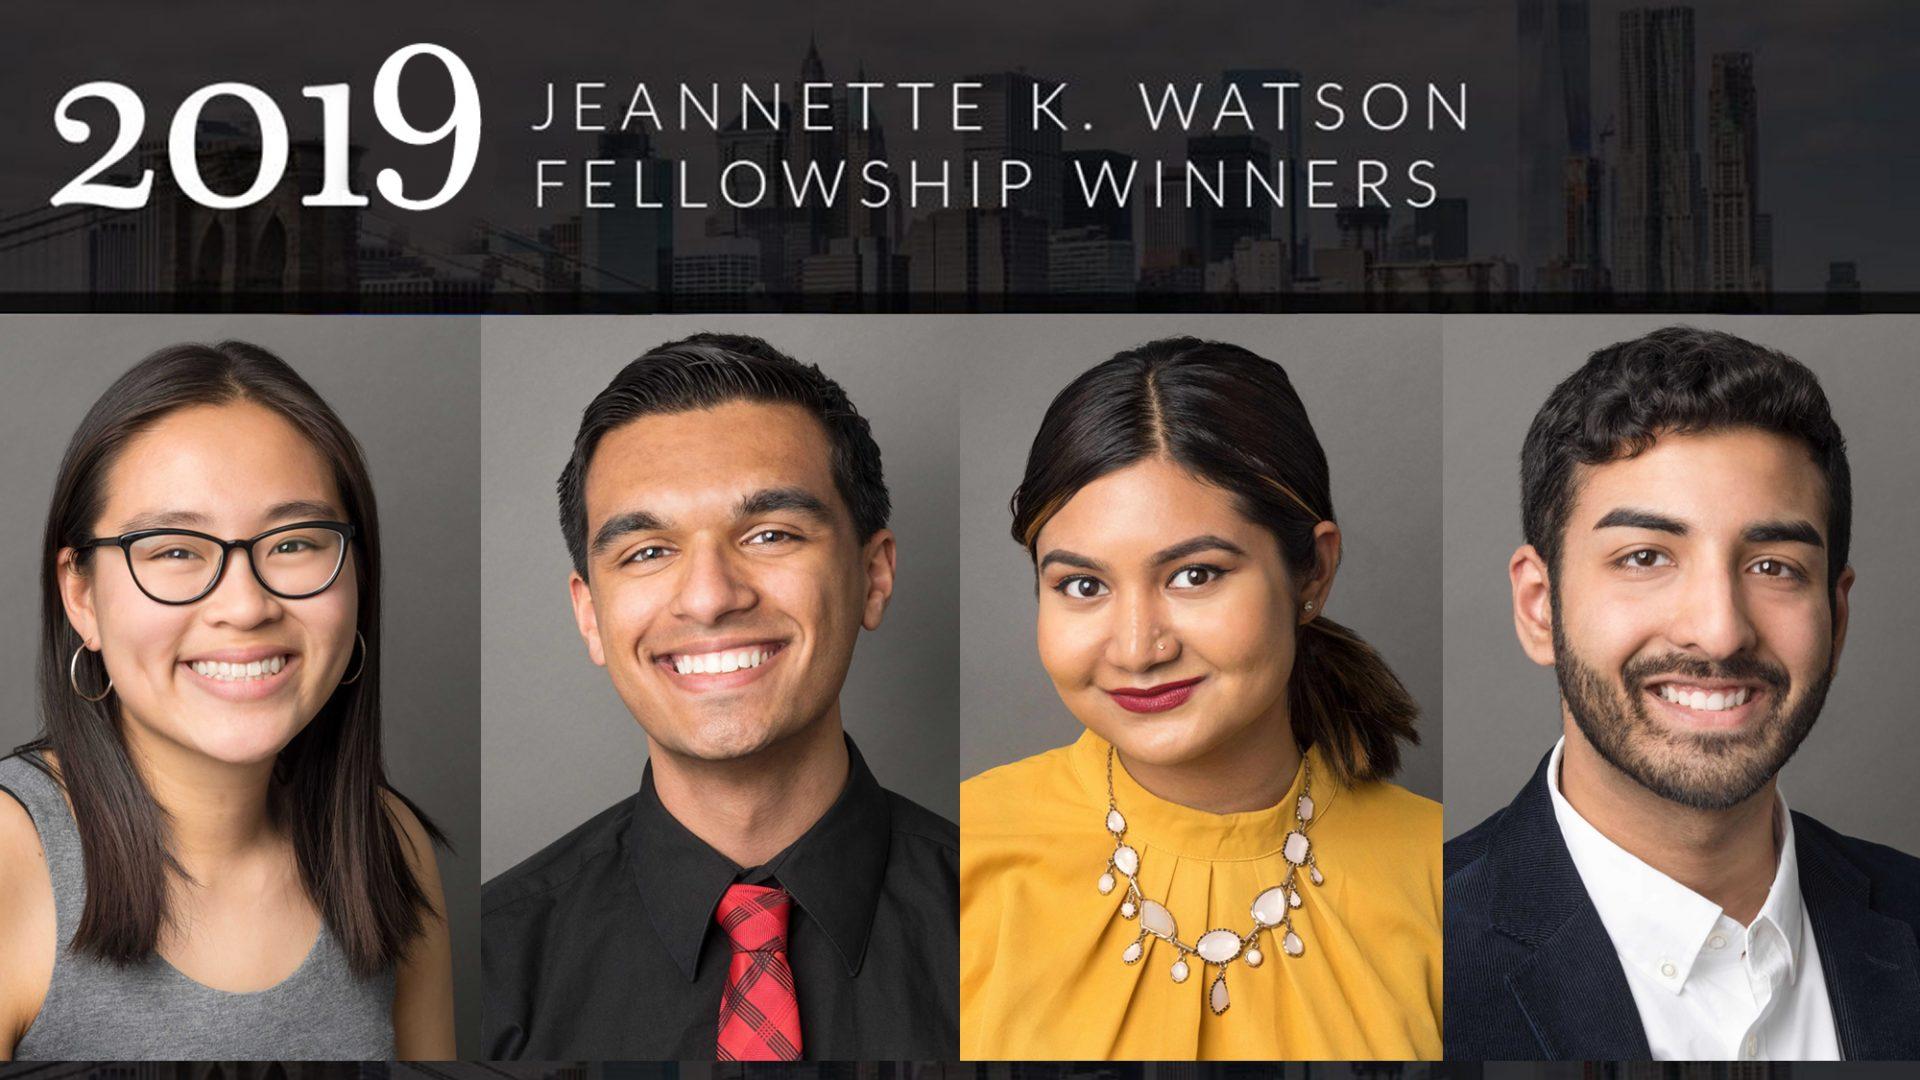 2019 Jeannette K. Watson Fellowship winners Amanda Zhu, Aaron Fernando, Hamida Chumpa and Nibras Ahmed.